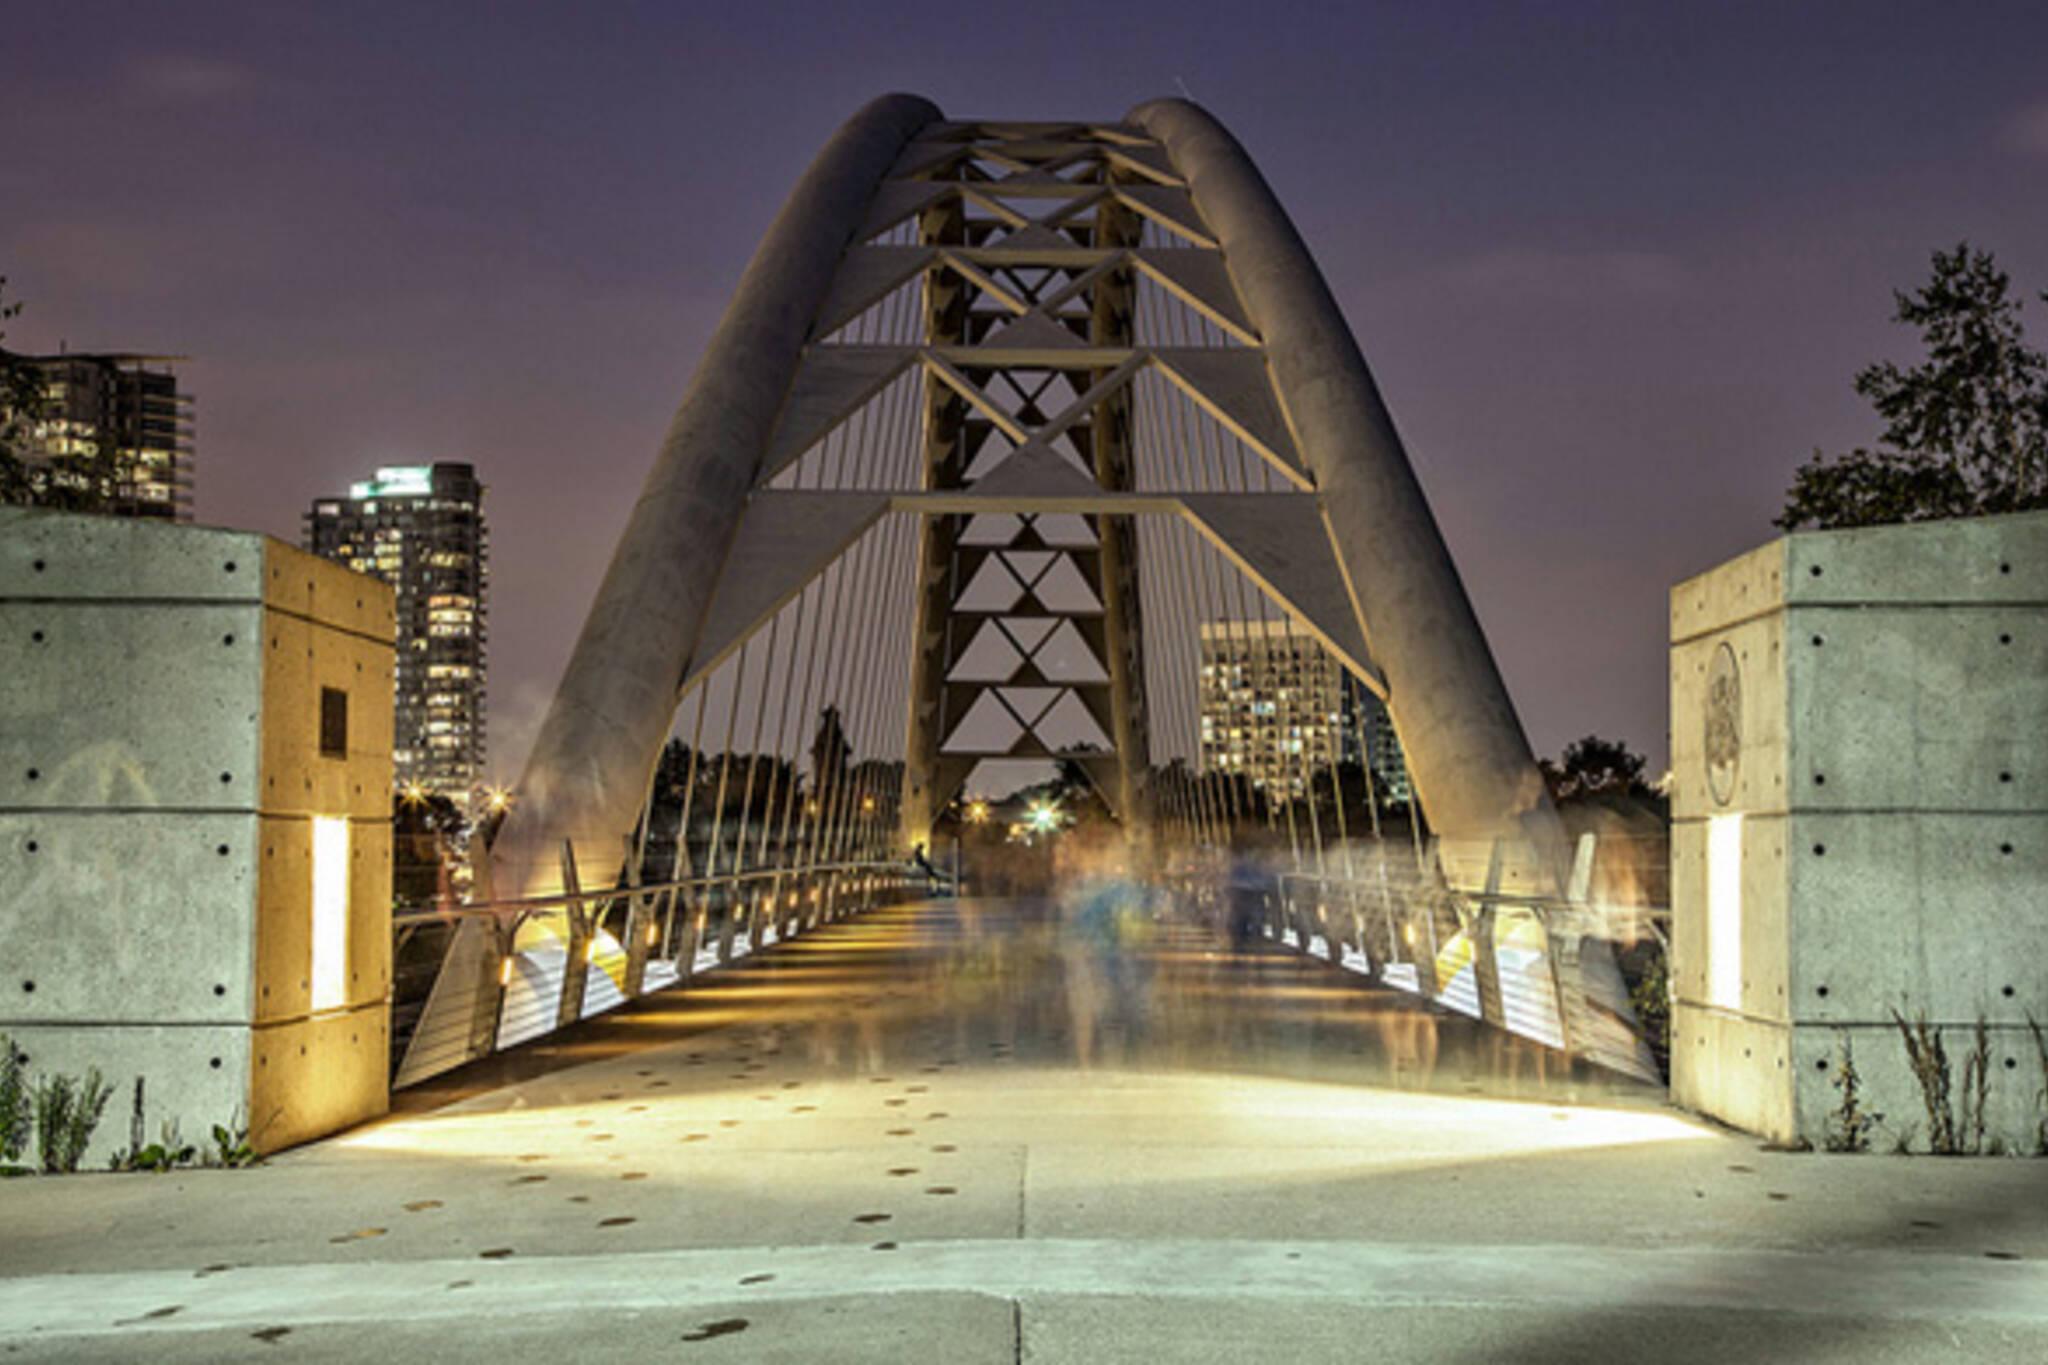 Humber Ba Arch Bridge